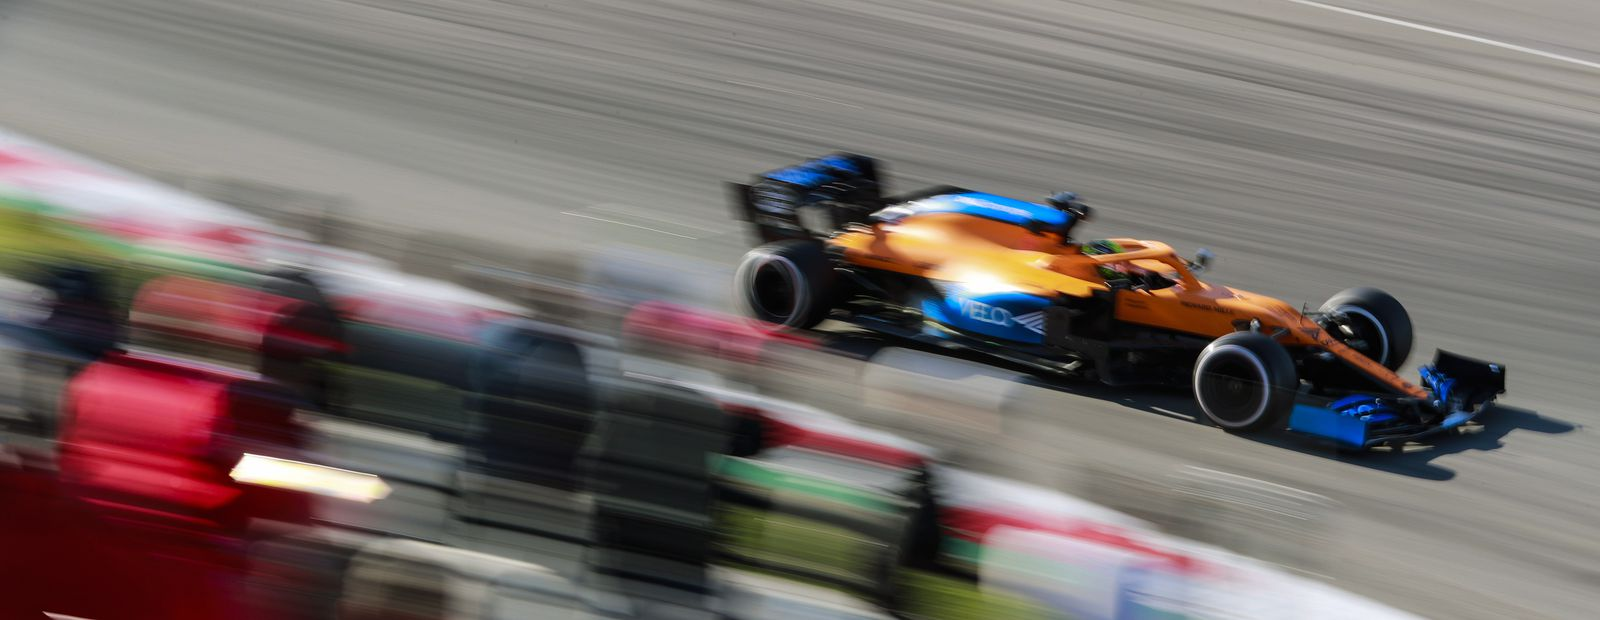 McLaren Racing announces multi-year partnership with Buzz & Co.